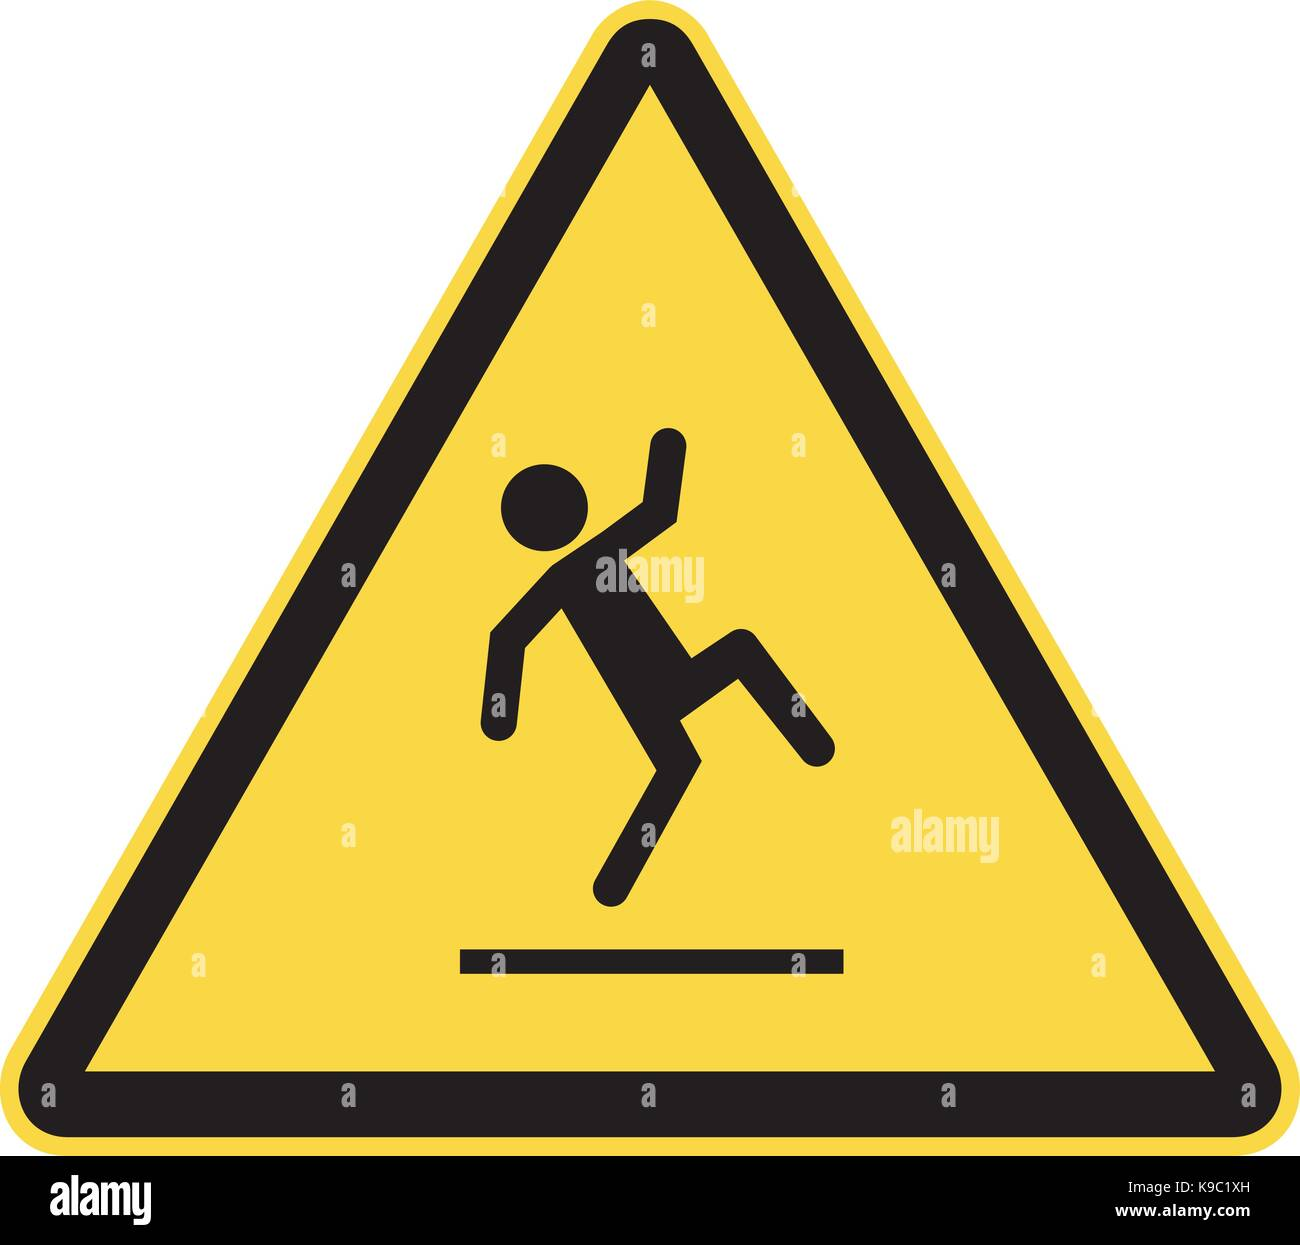 slippery floor warning sign - Stock Image